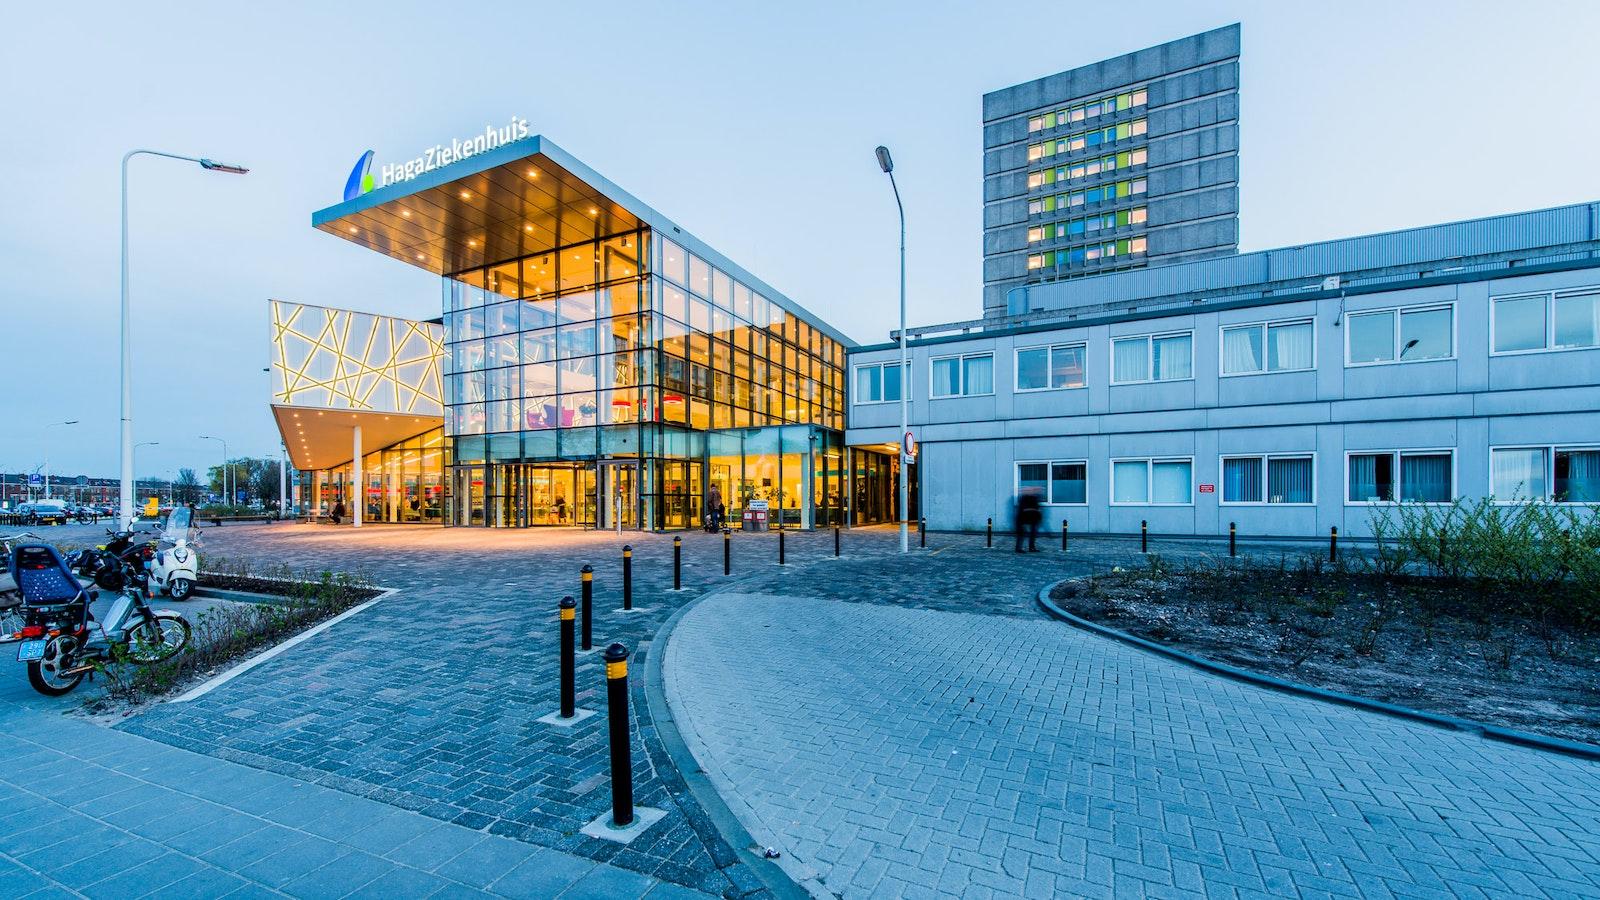 Facade Hagaziekenhuis Den Haag